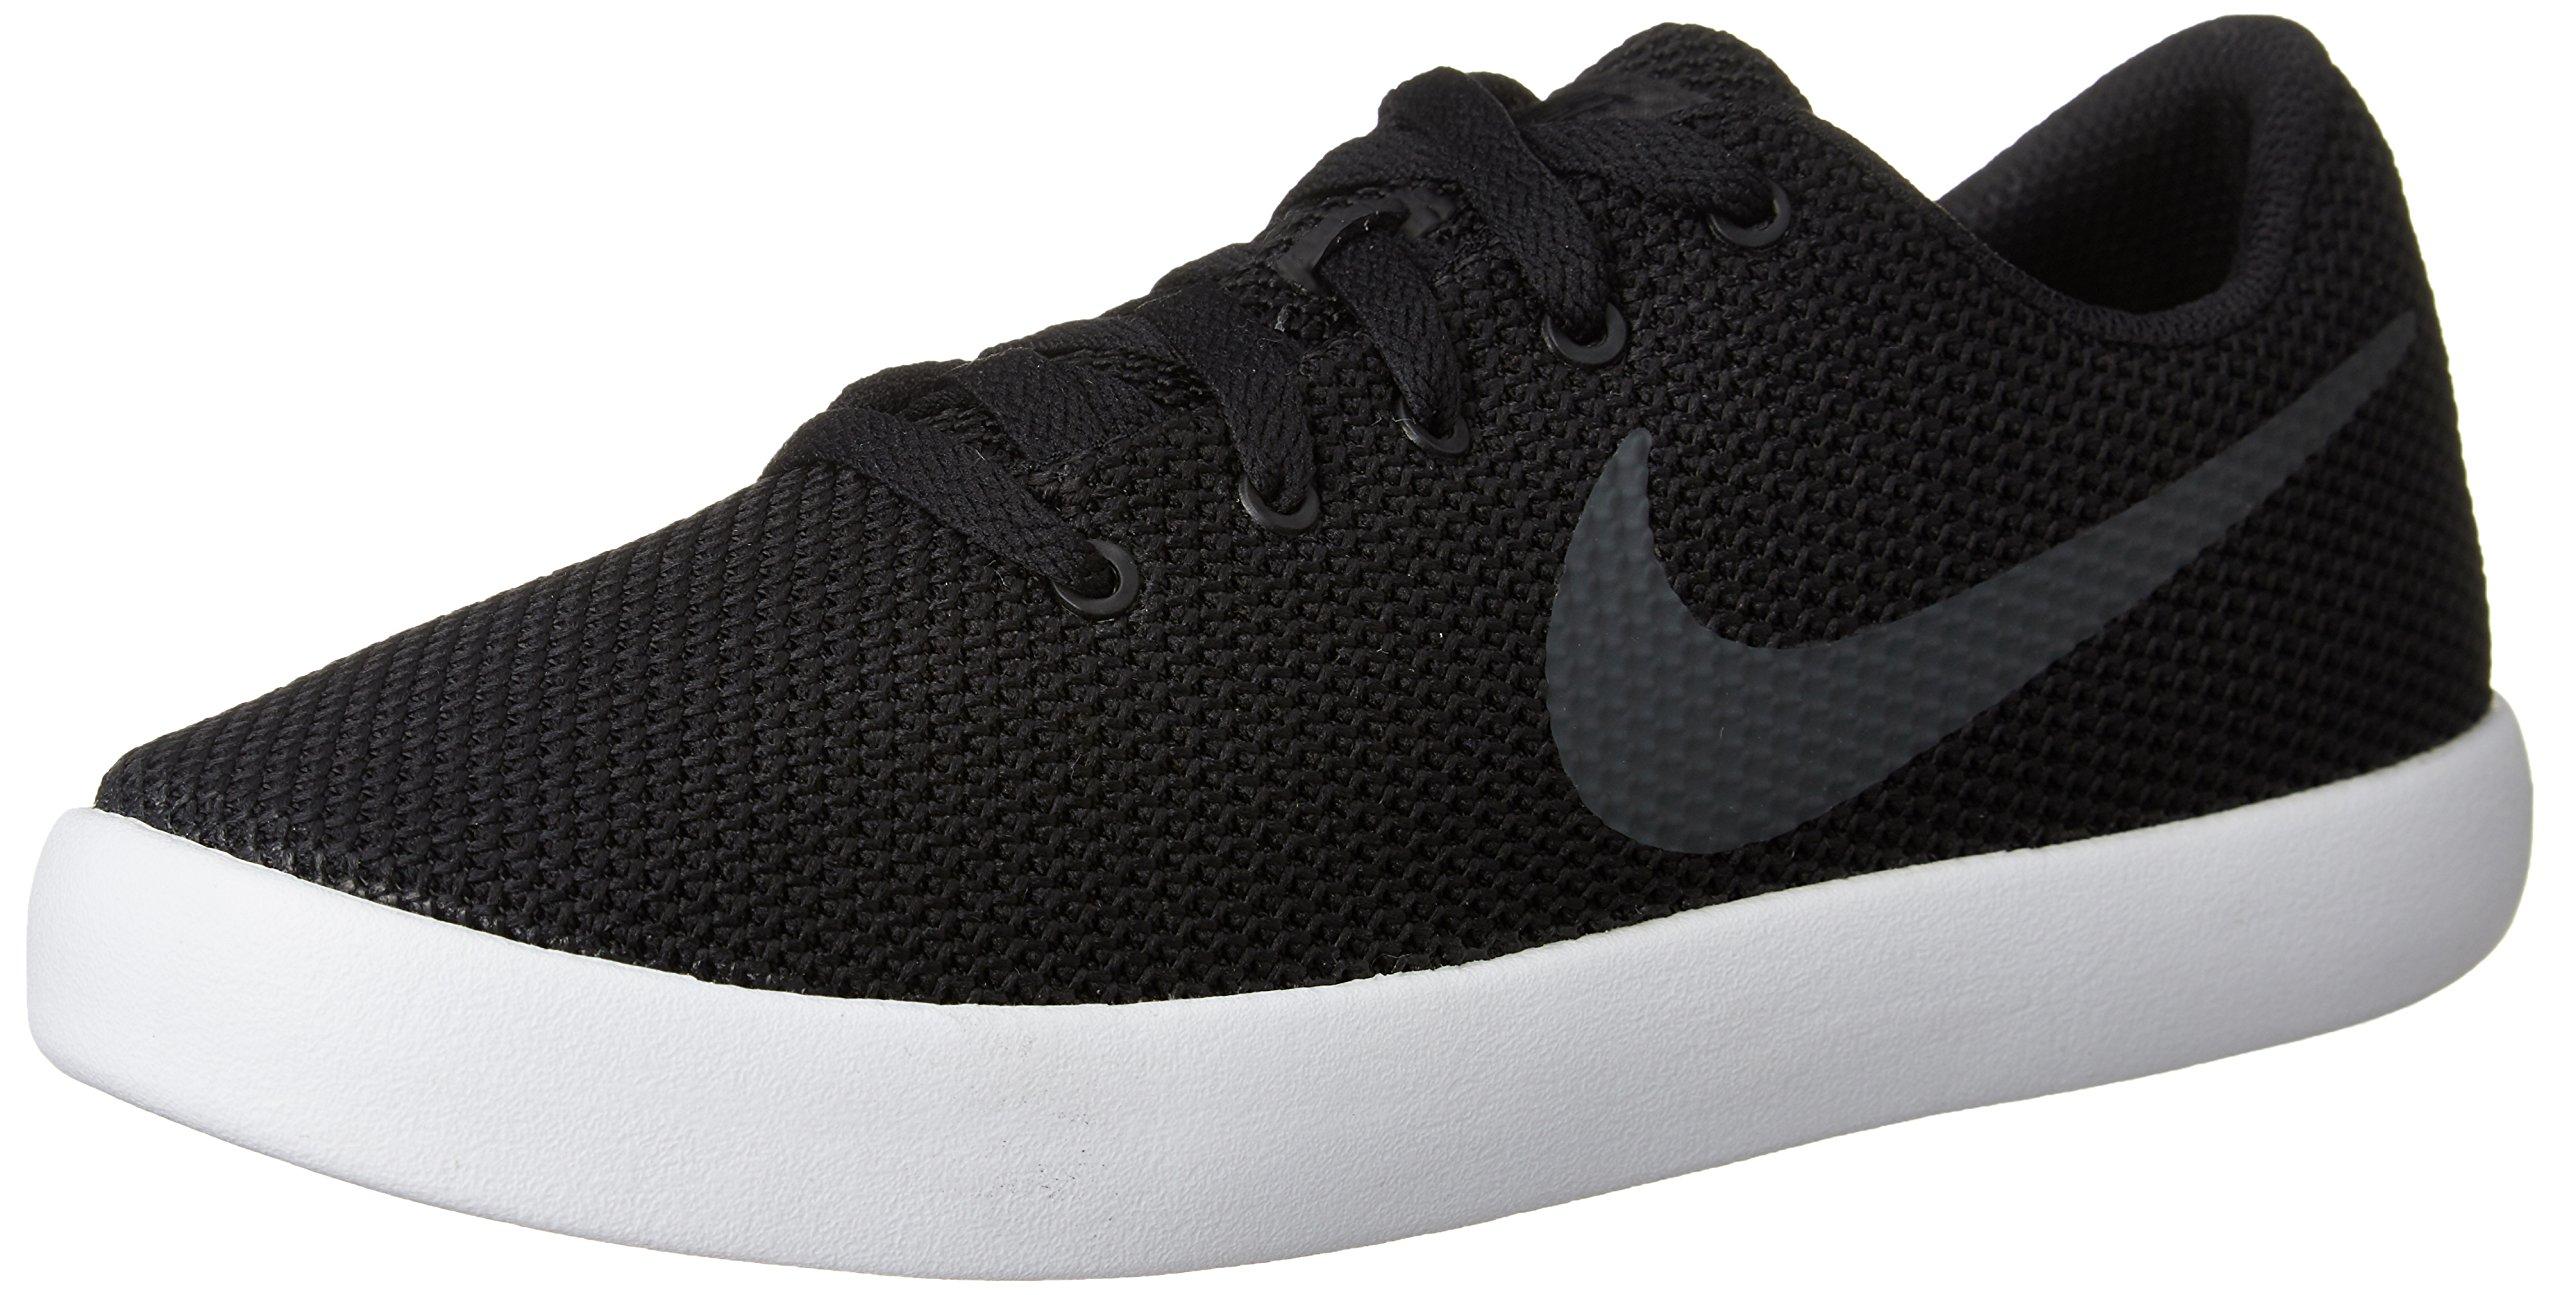 Hommenoir anthracite blanc41 Eu Nike EssentialistChaussures De Tennis 4ALjR35q